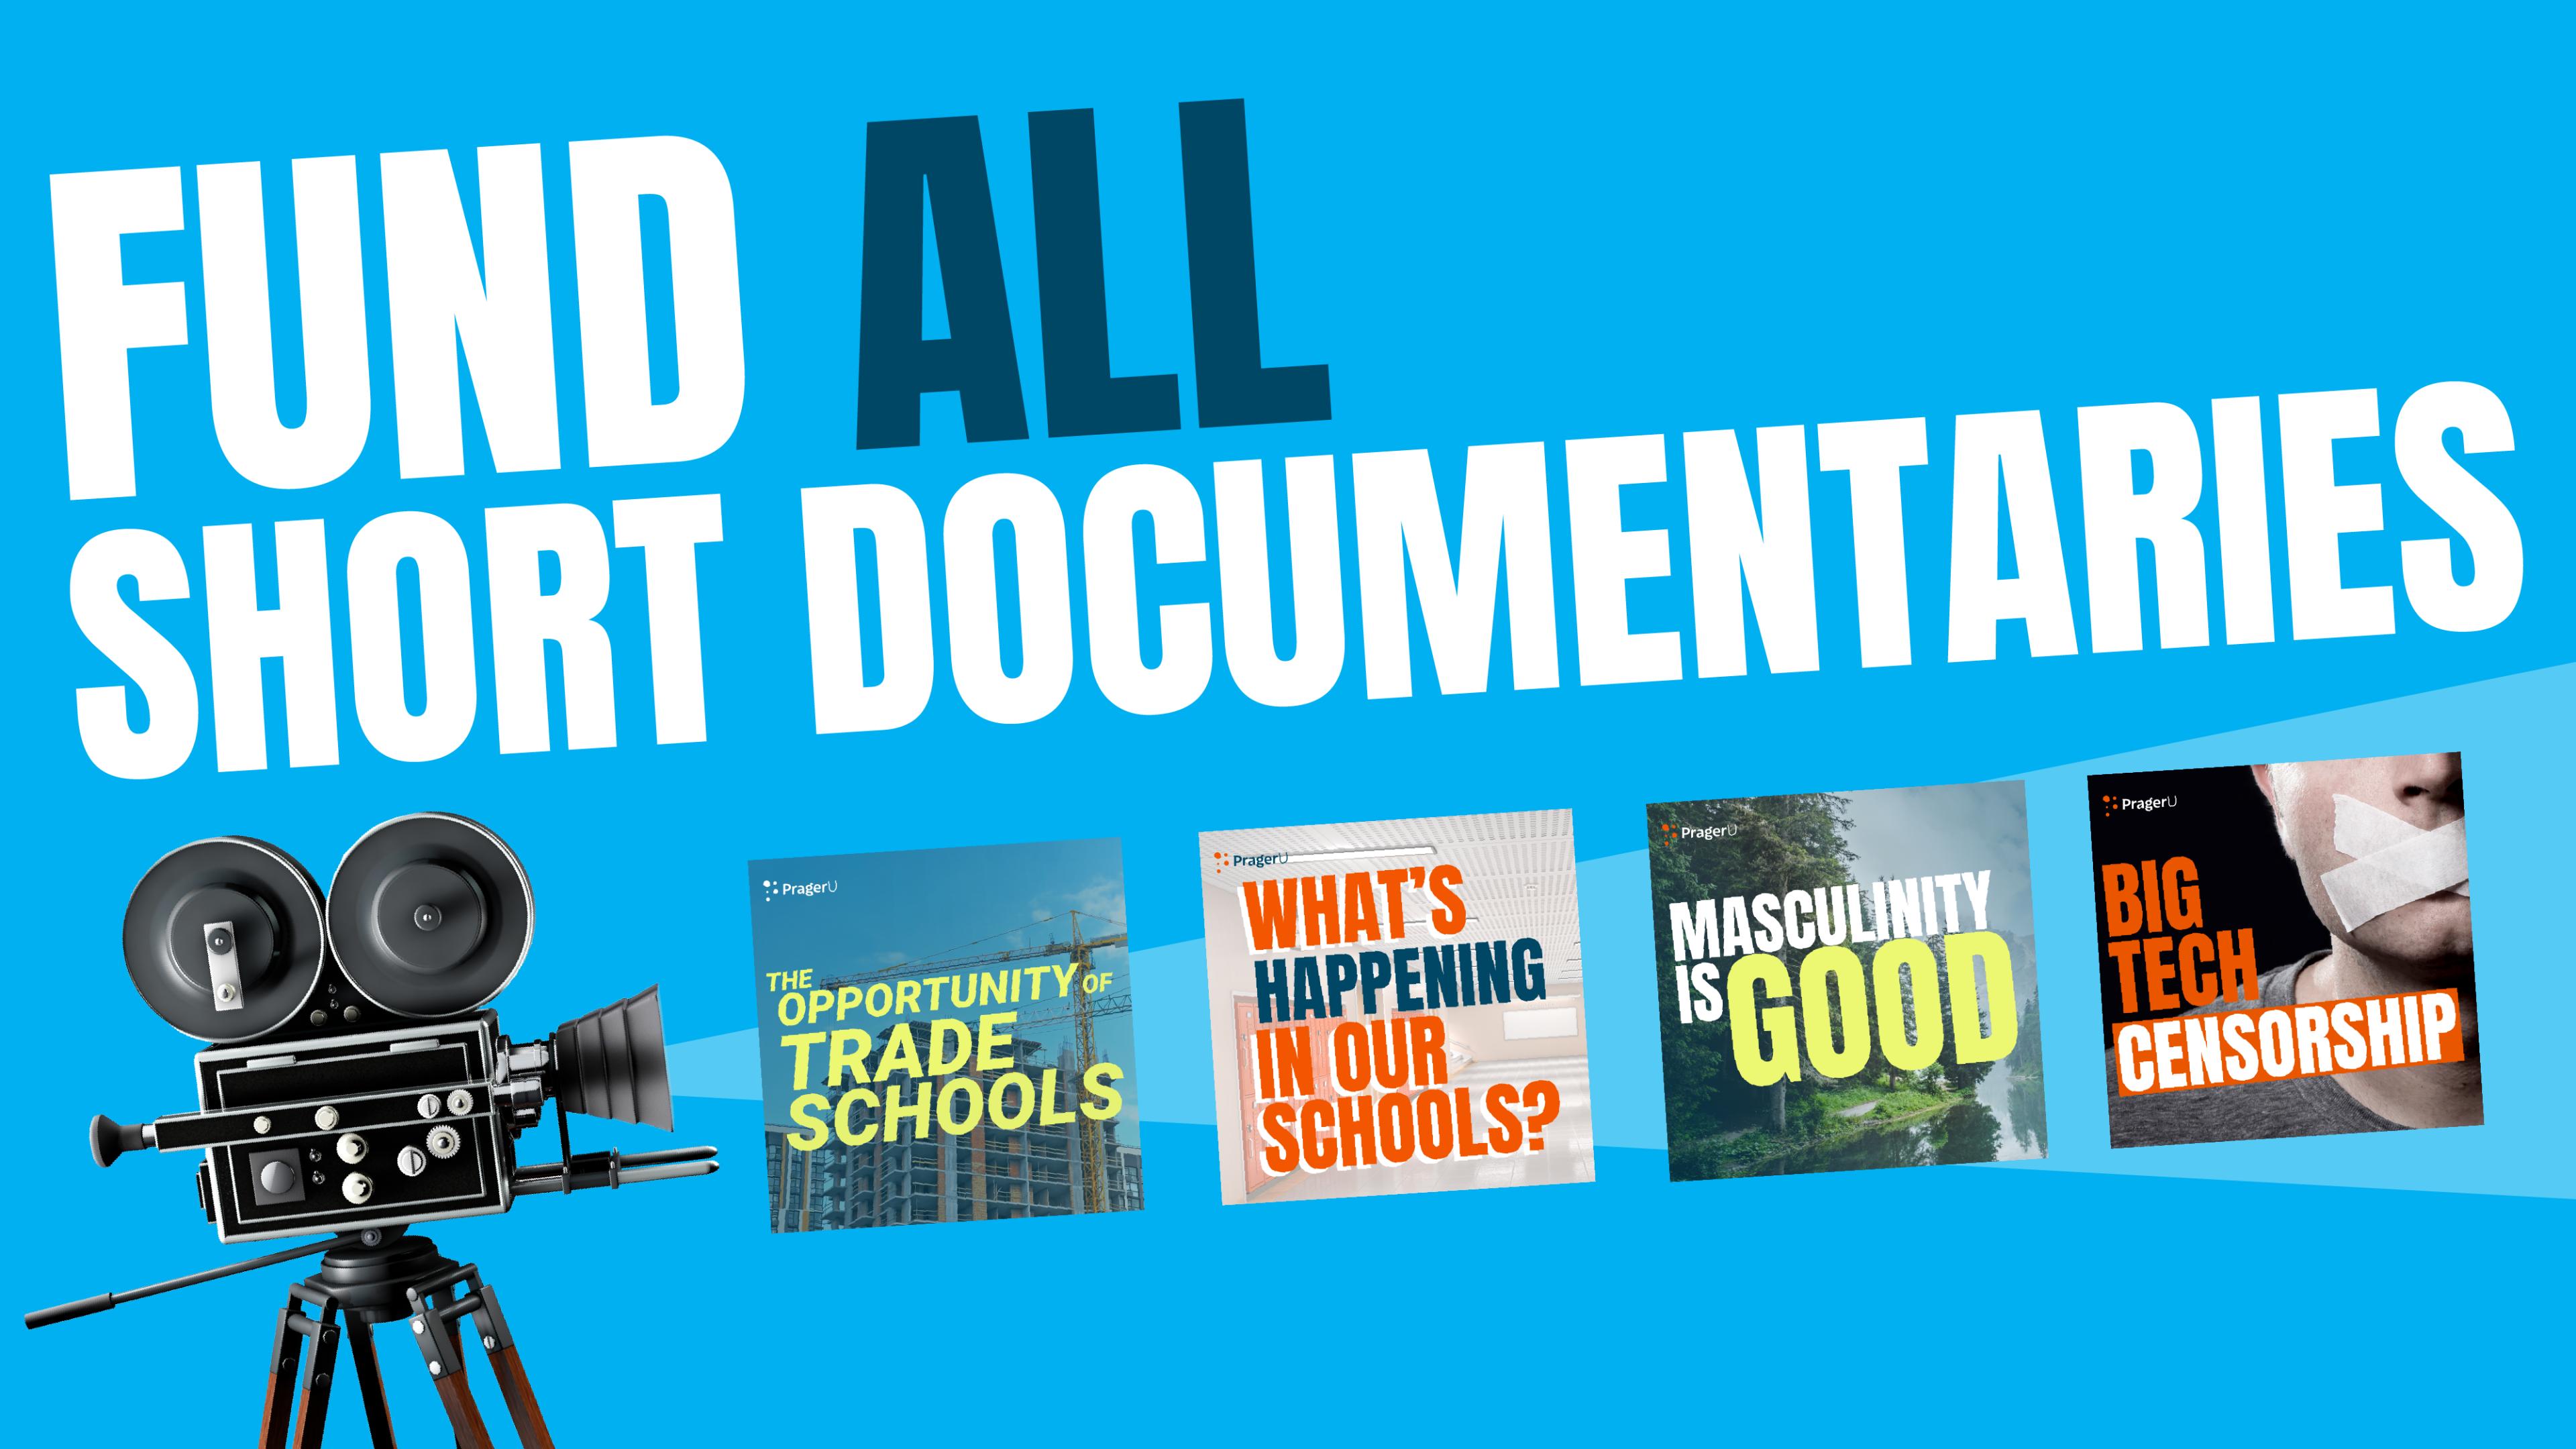 HeroImage MiniDocs FundAllShortDocumentaries-15